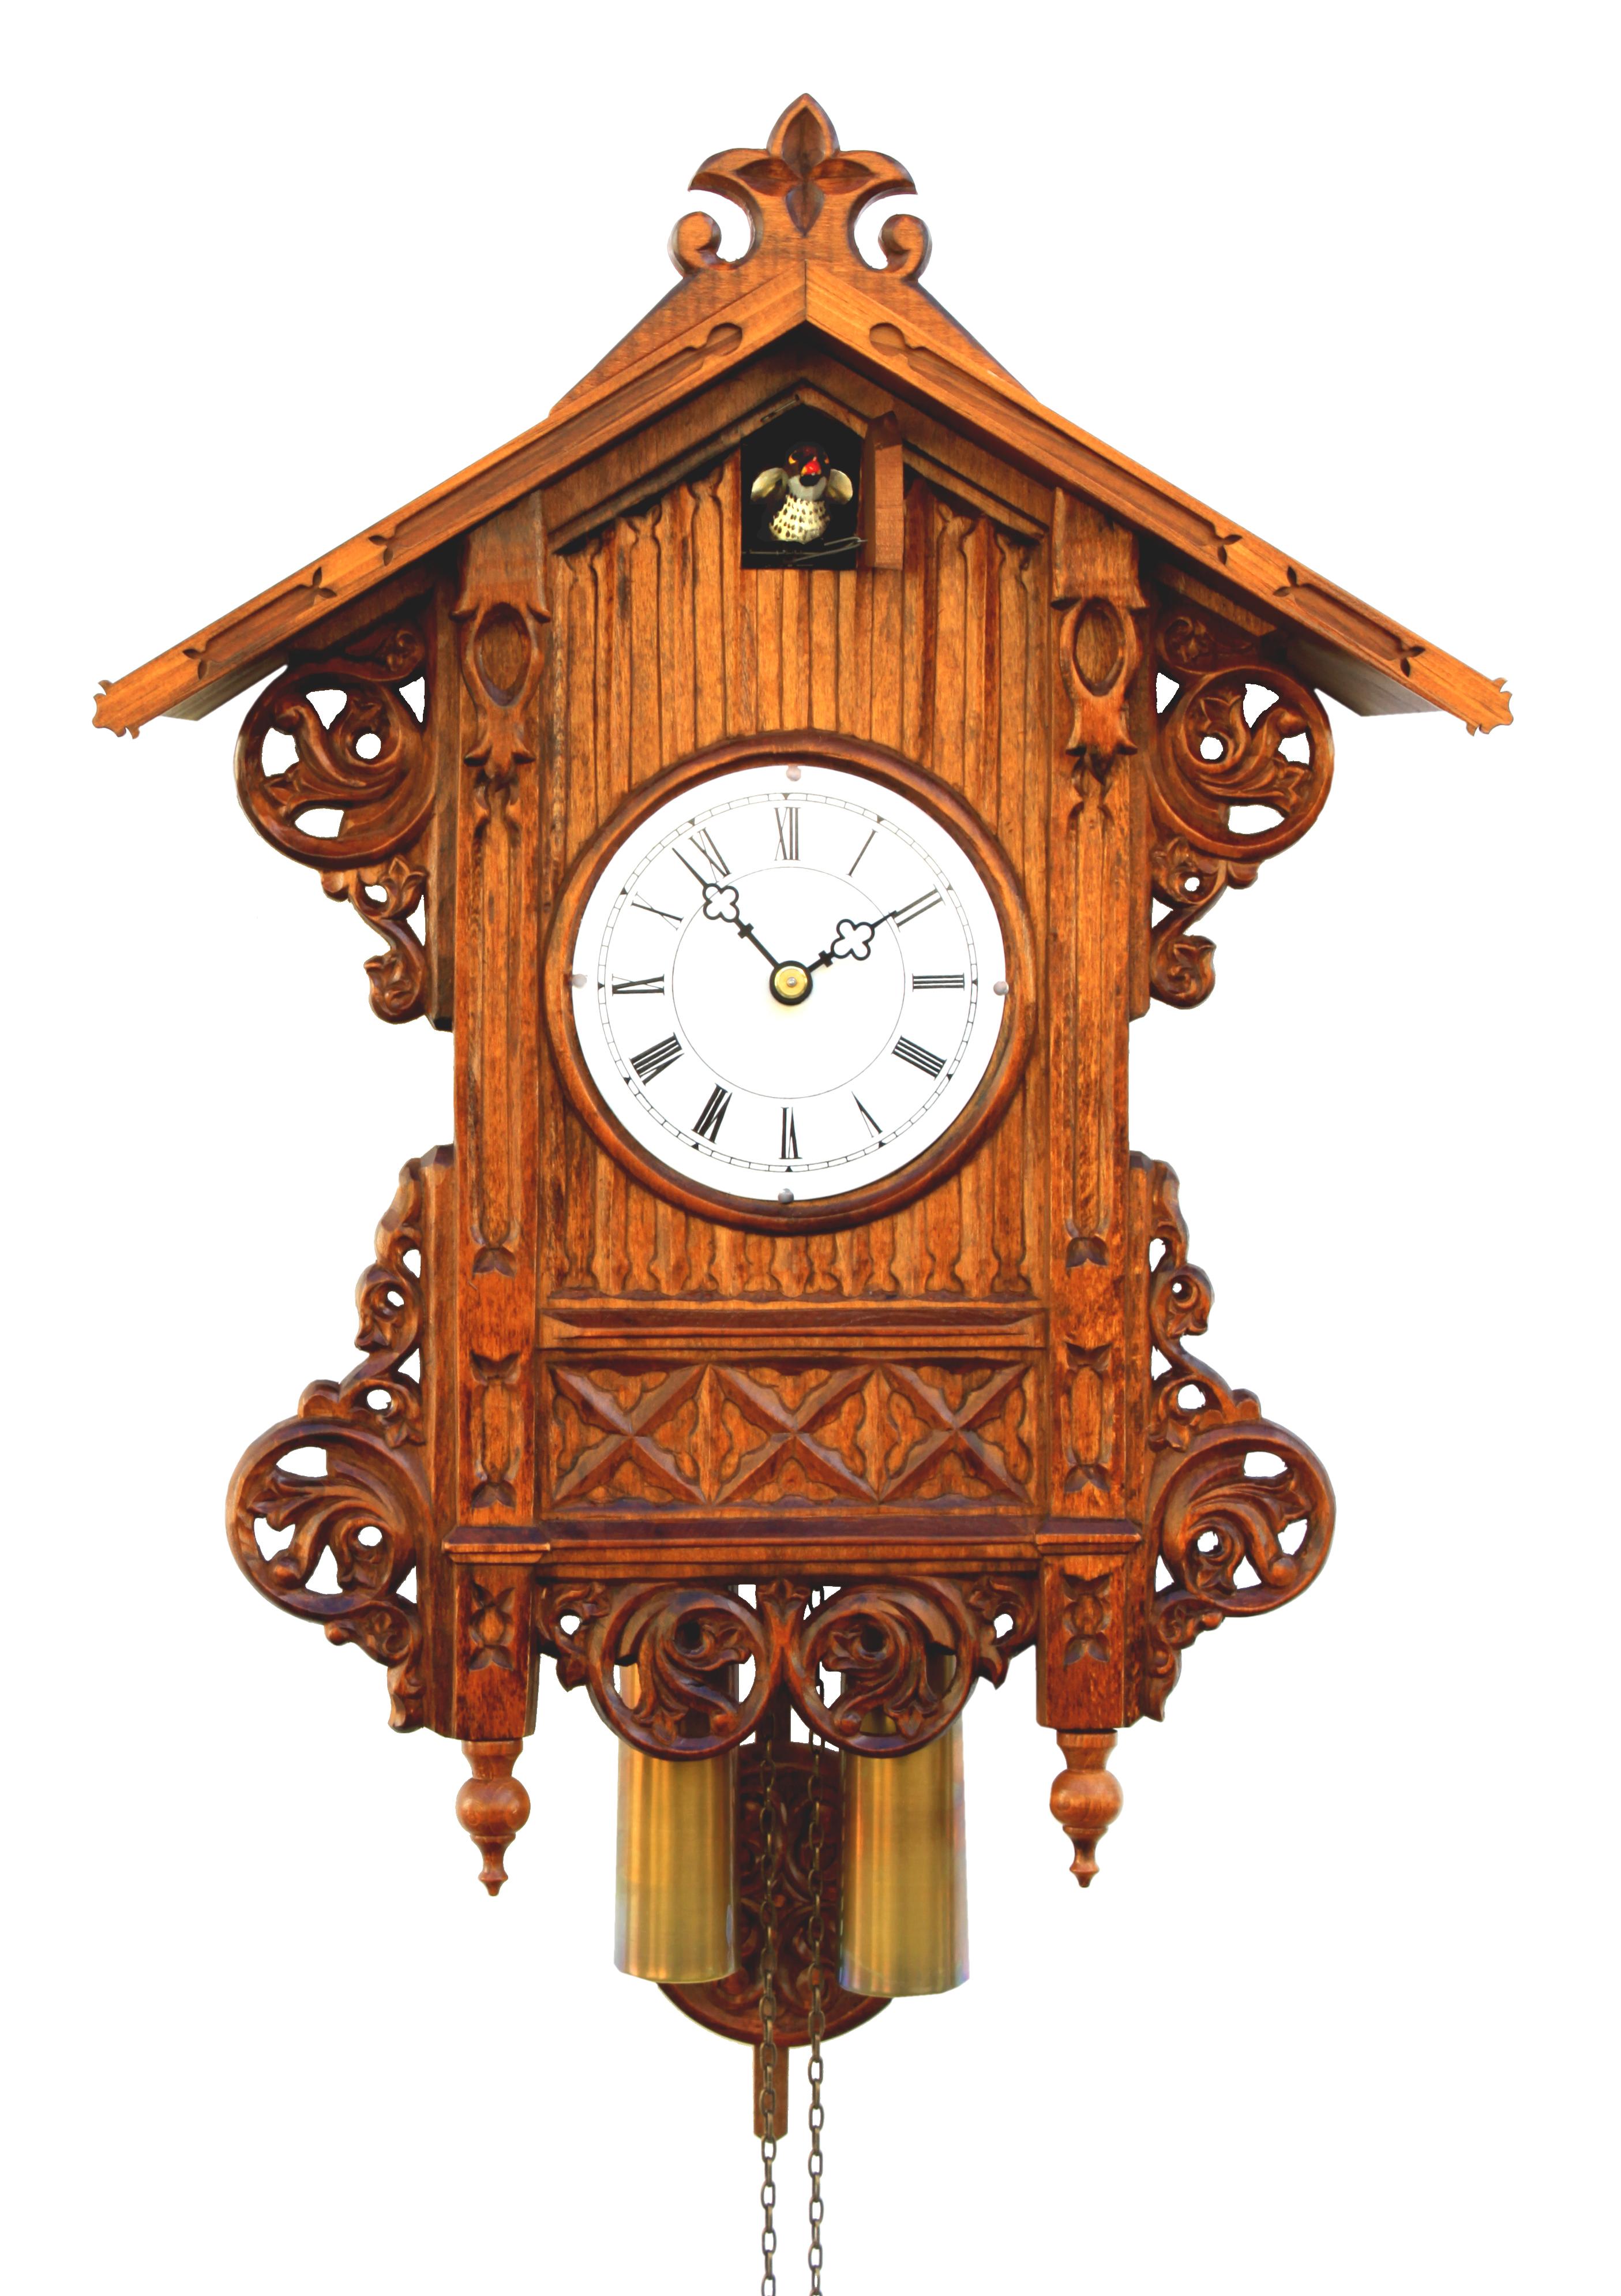 Historical 8 Day Cuckoo Clock